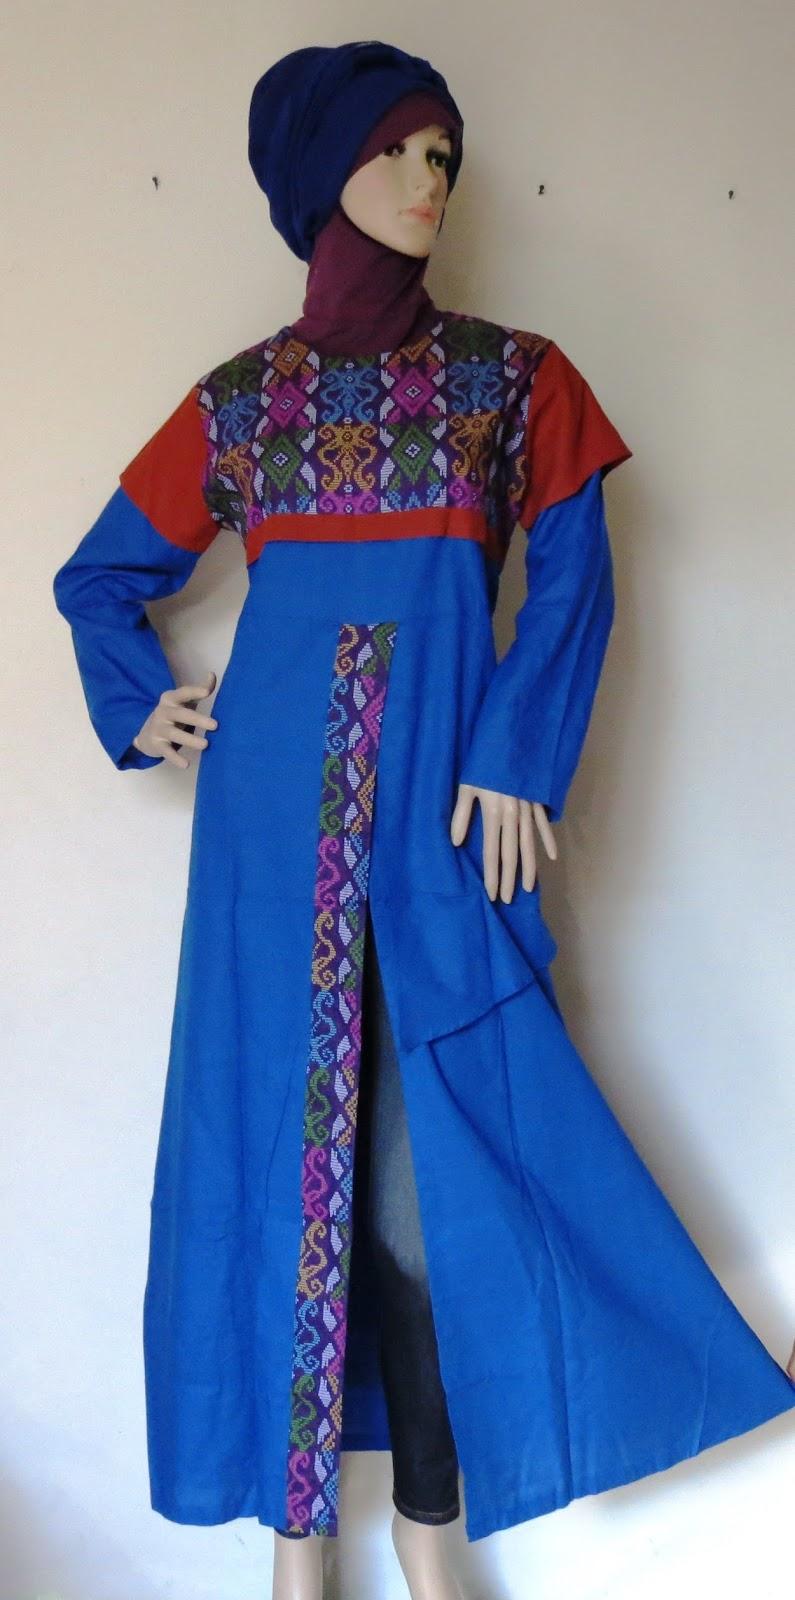 Grosir Baju Muslim Murah Tanah Abang